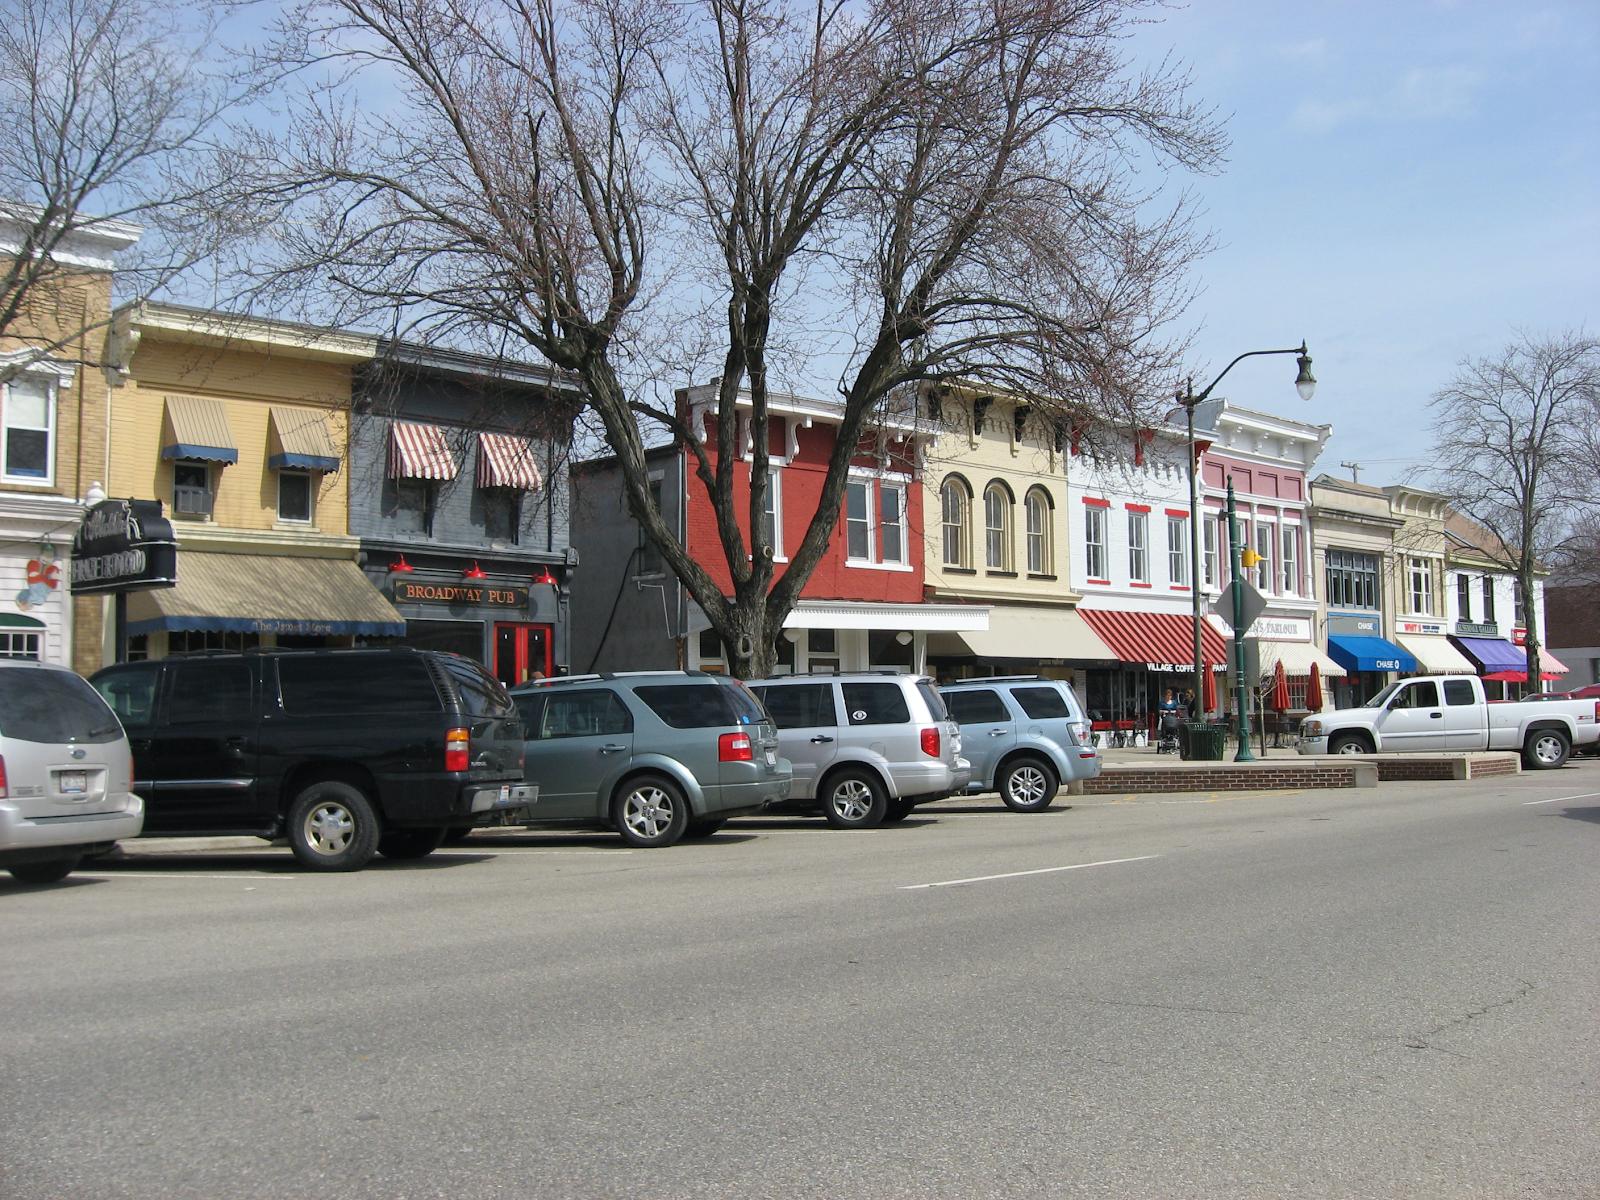 shops on broadway